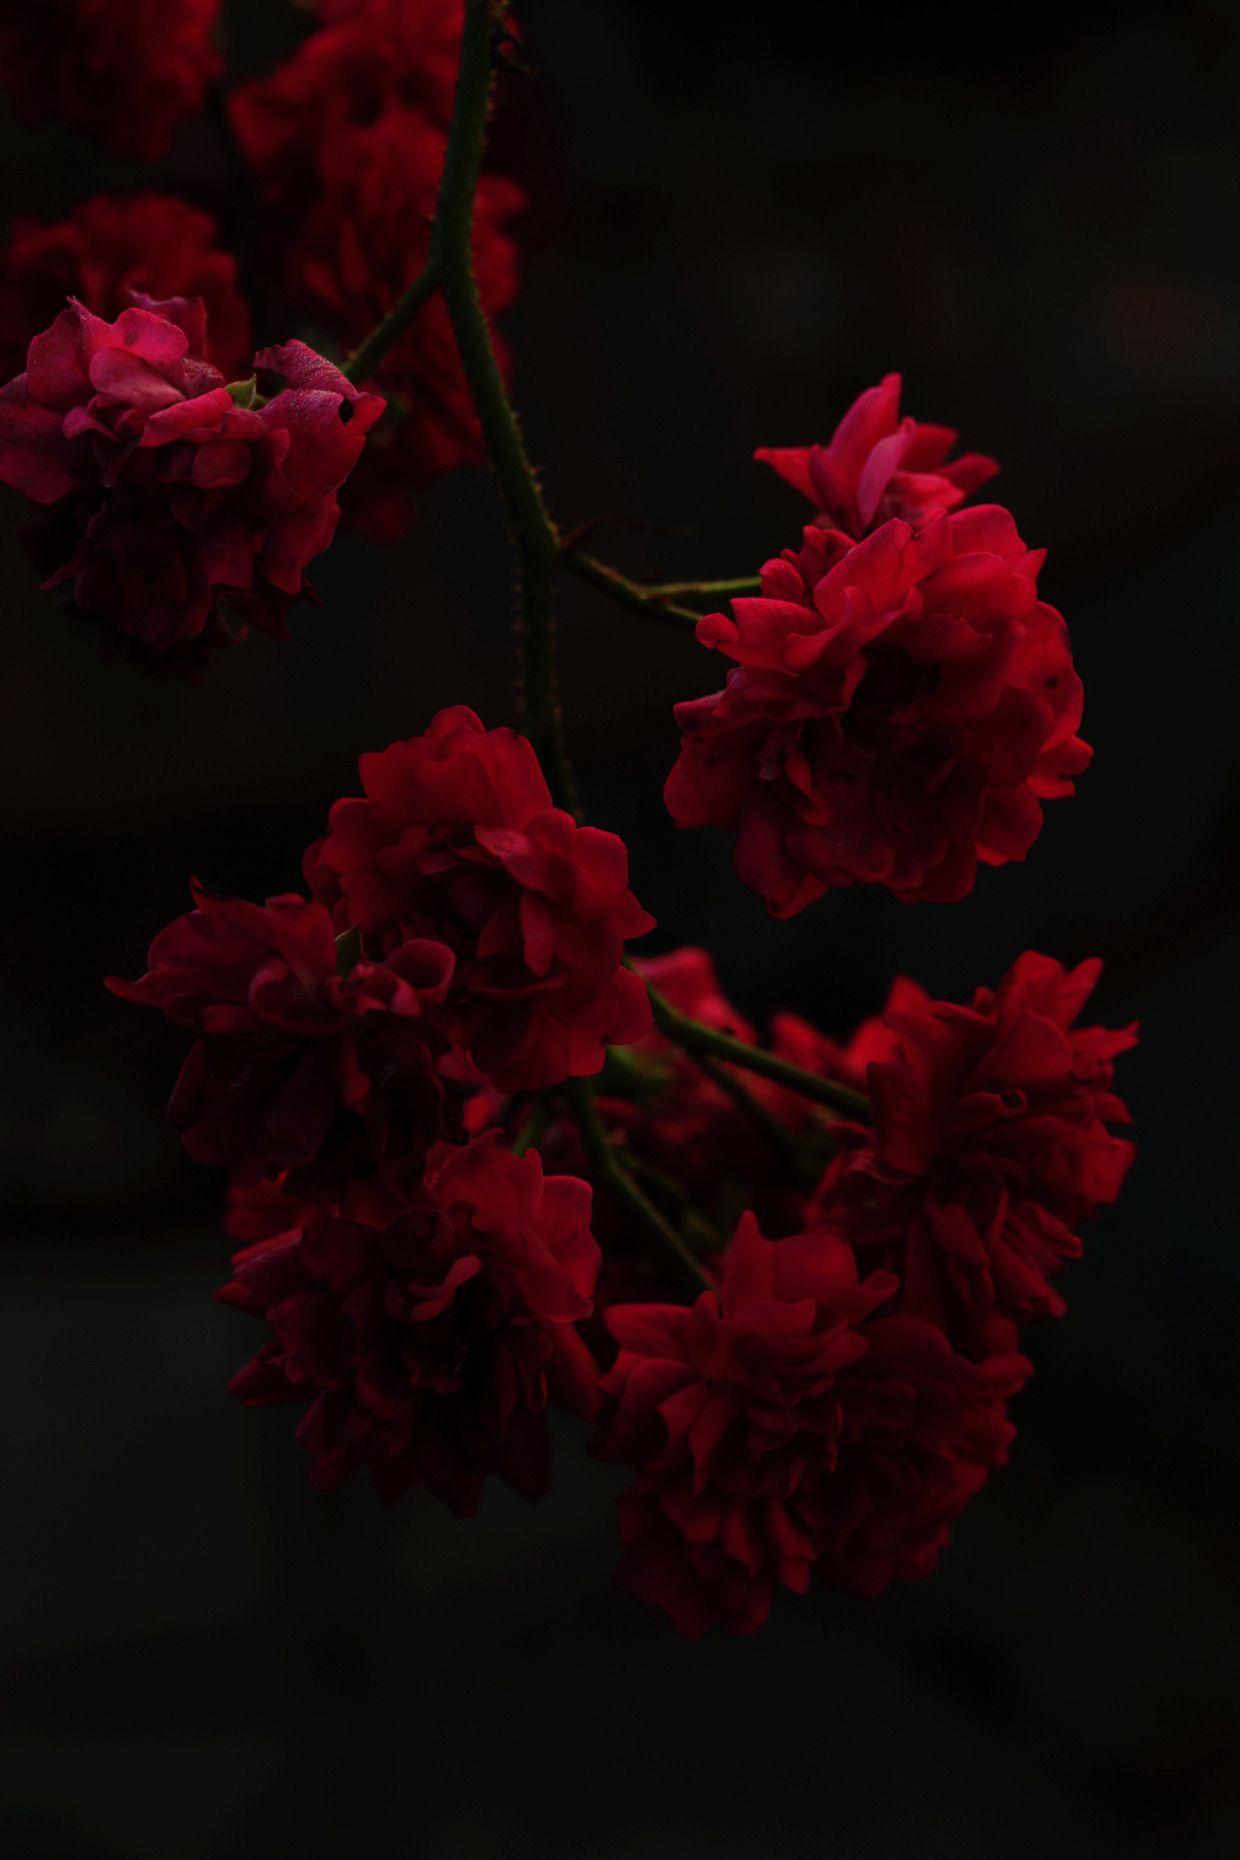 Download 600 Wallpaper Black Red Flowers  Gratis